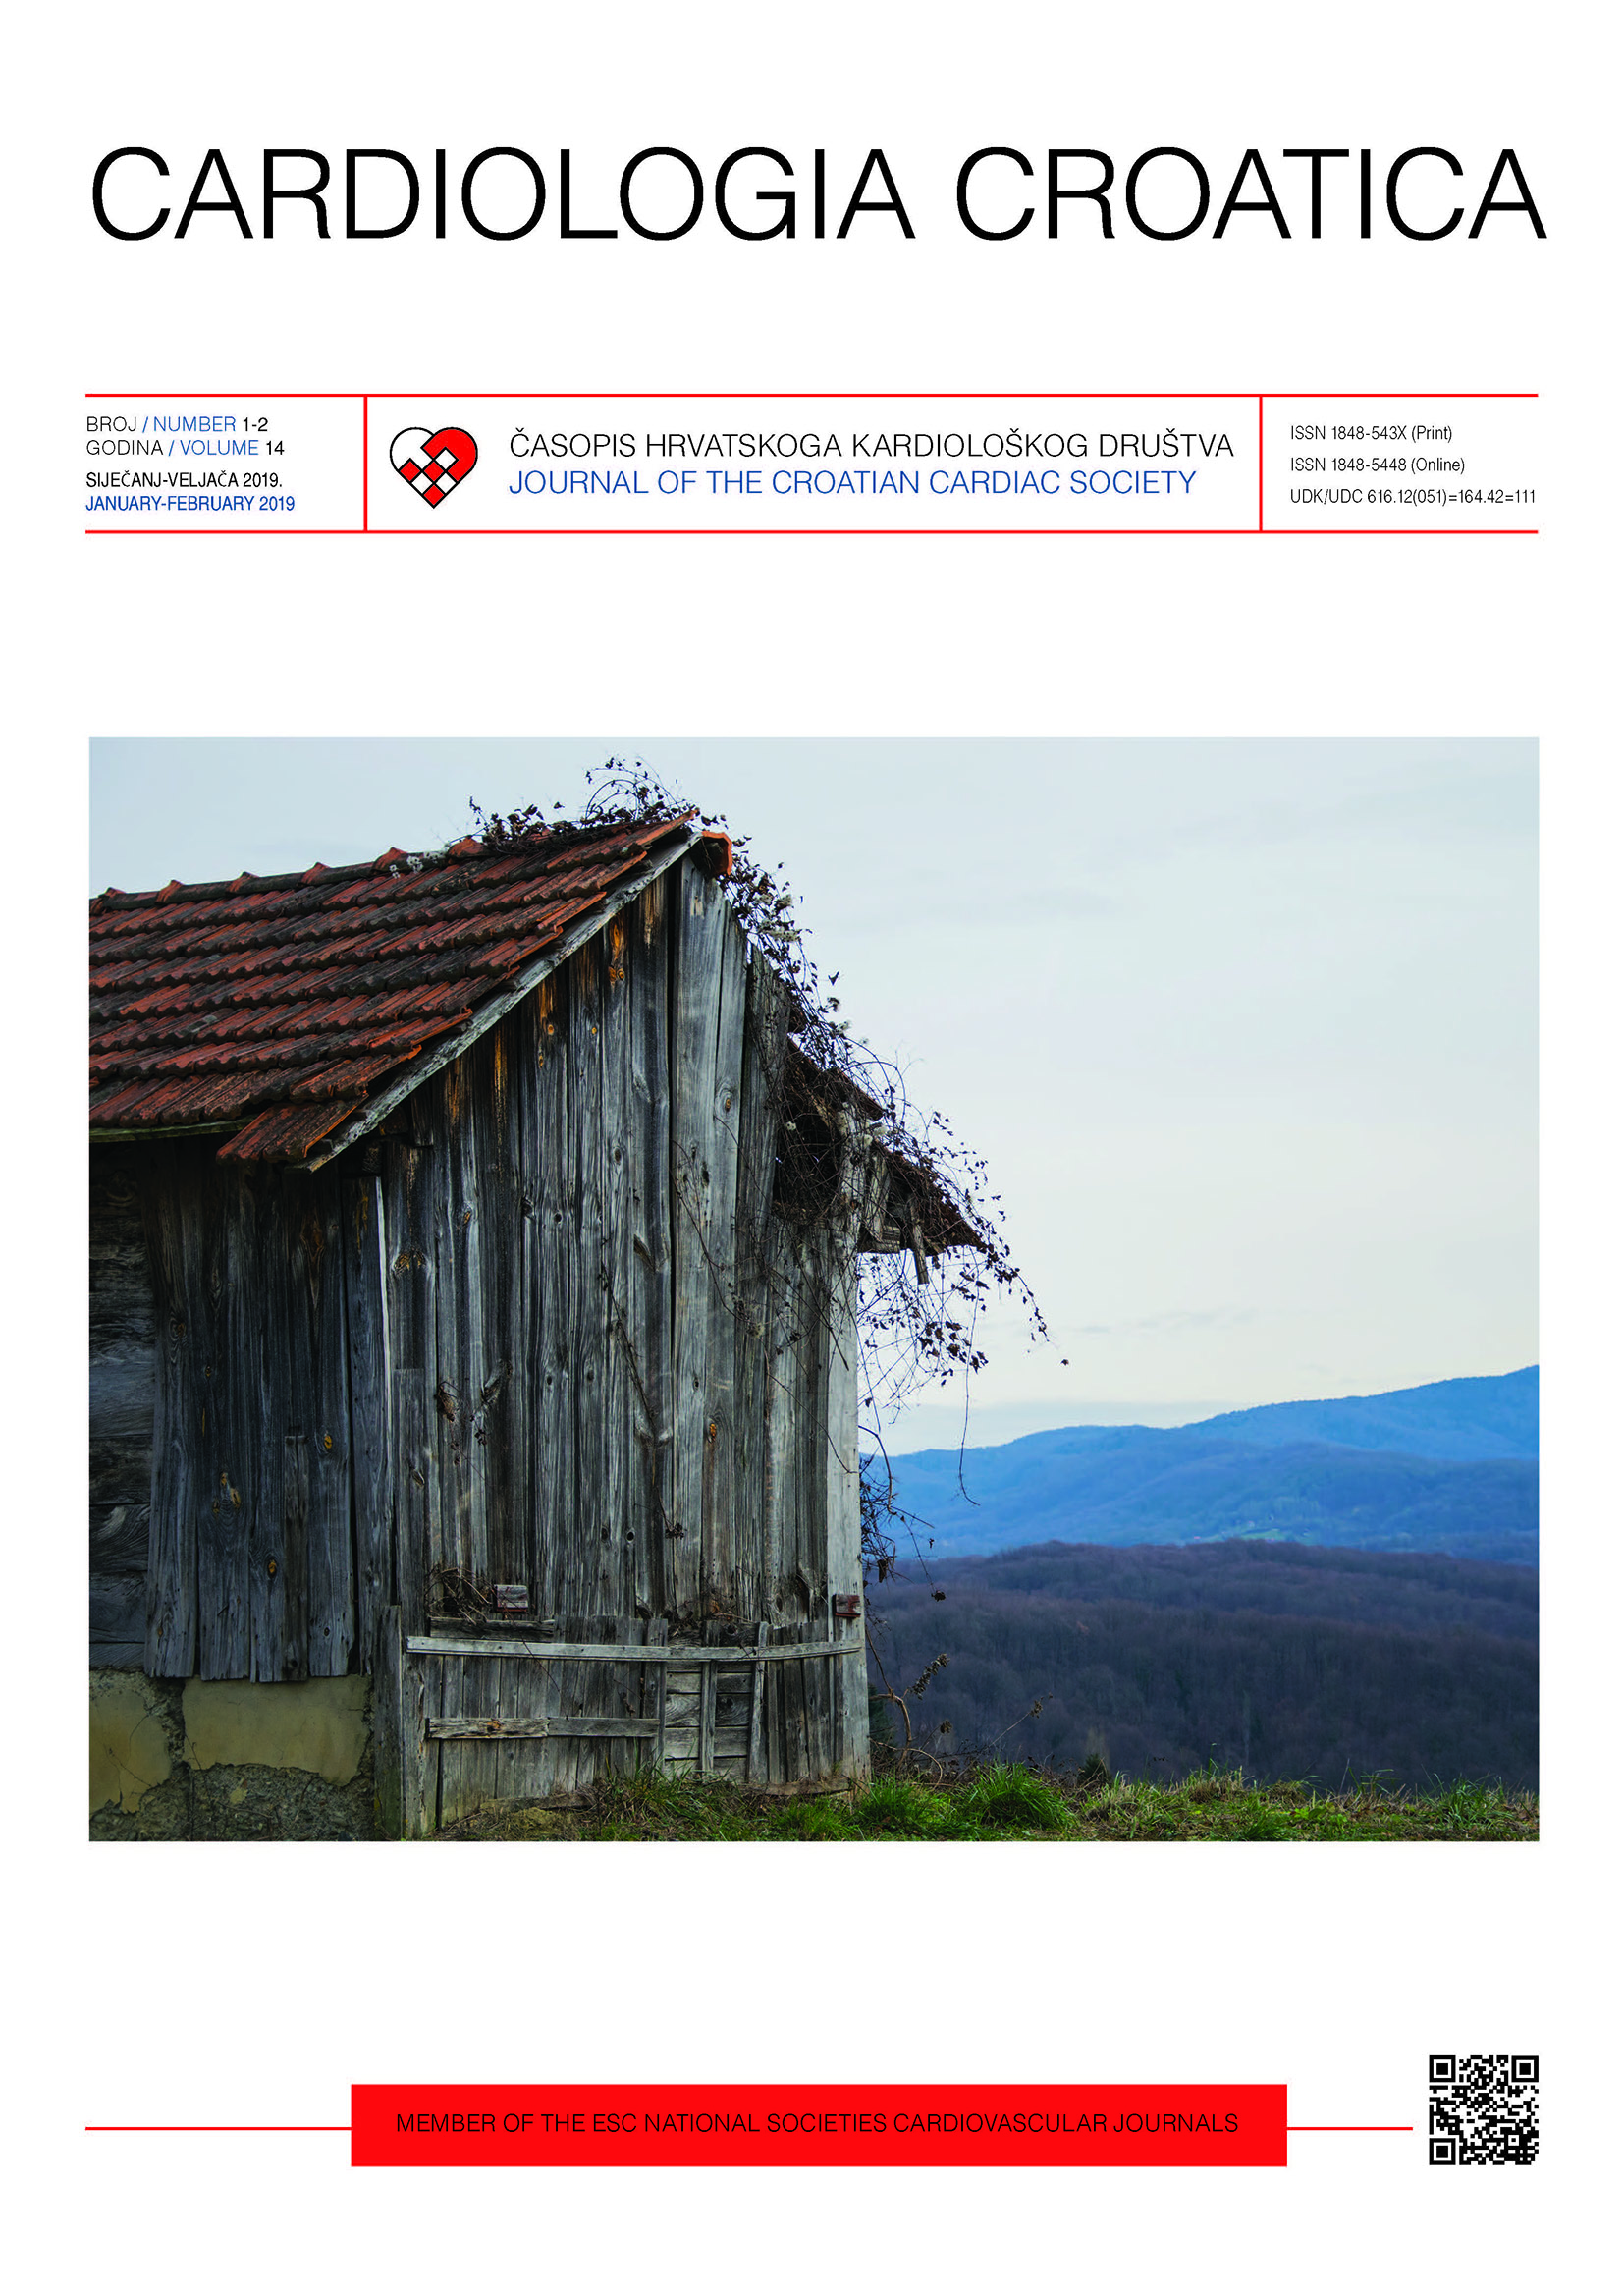 Cardiologia croatica 2019 14_1-2_1_COVER